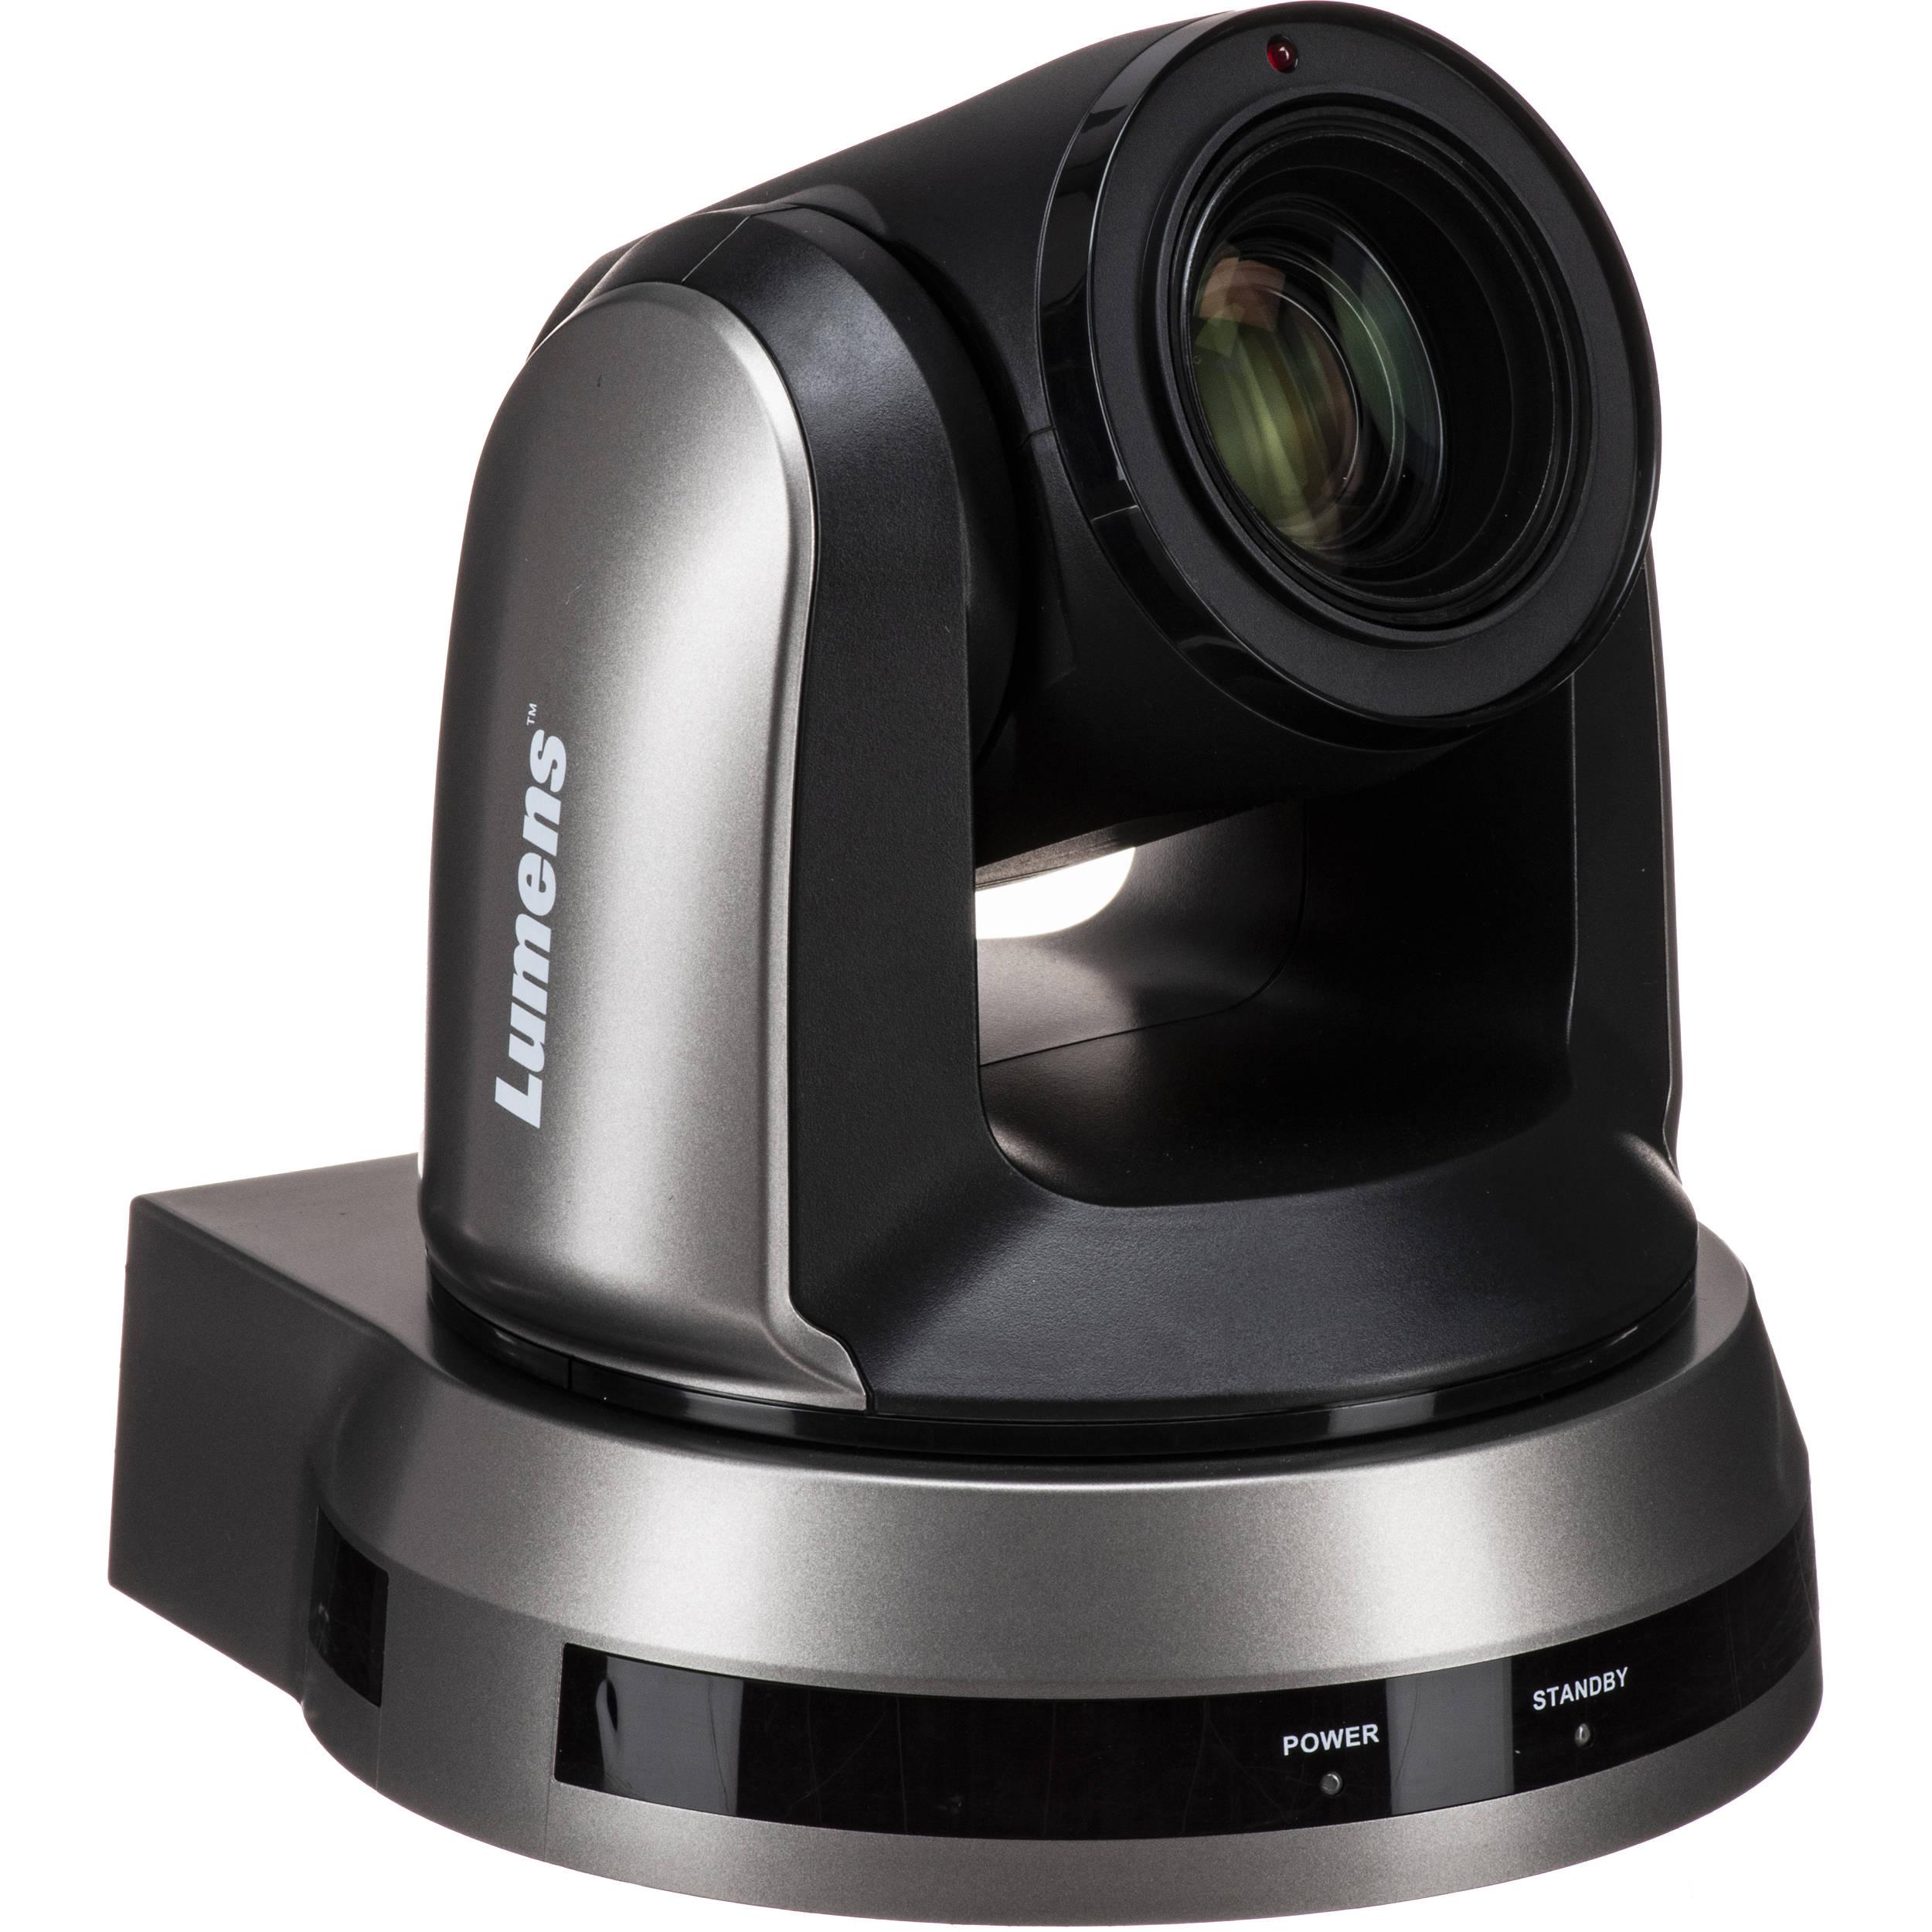 Lumens 4K UHD 12x Optical Zoom PTZ Video Camera (Black)